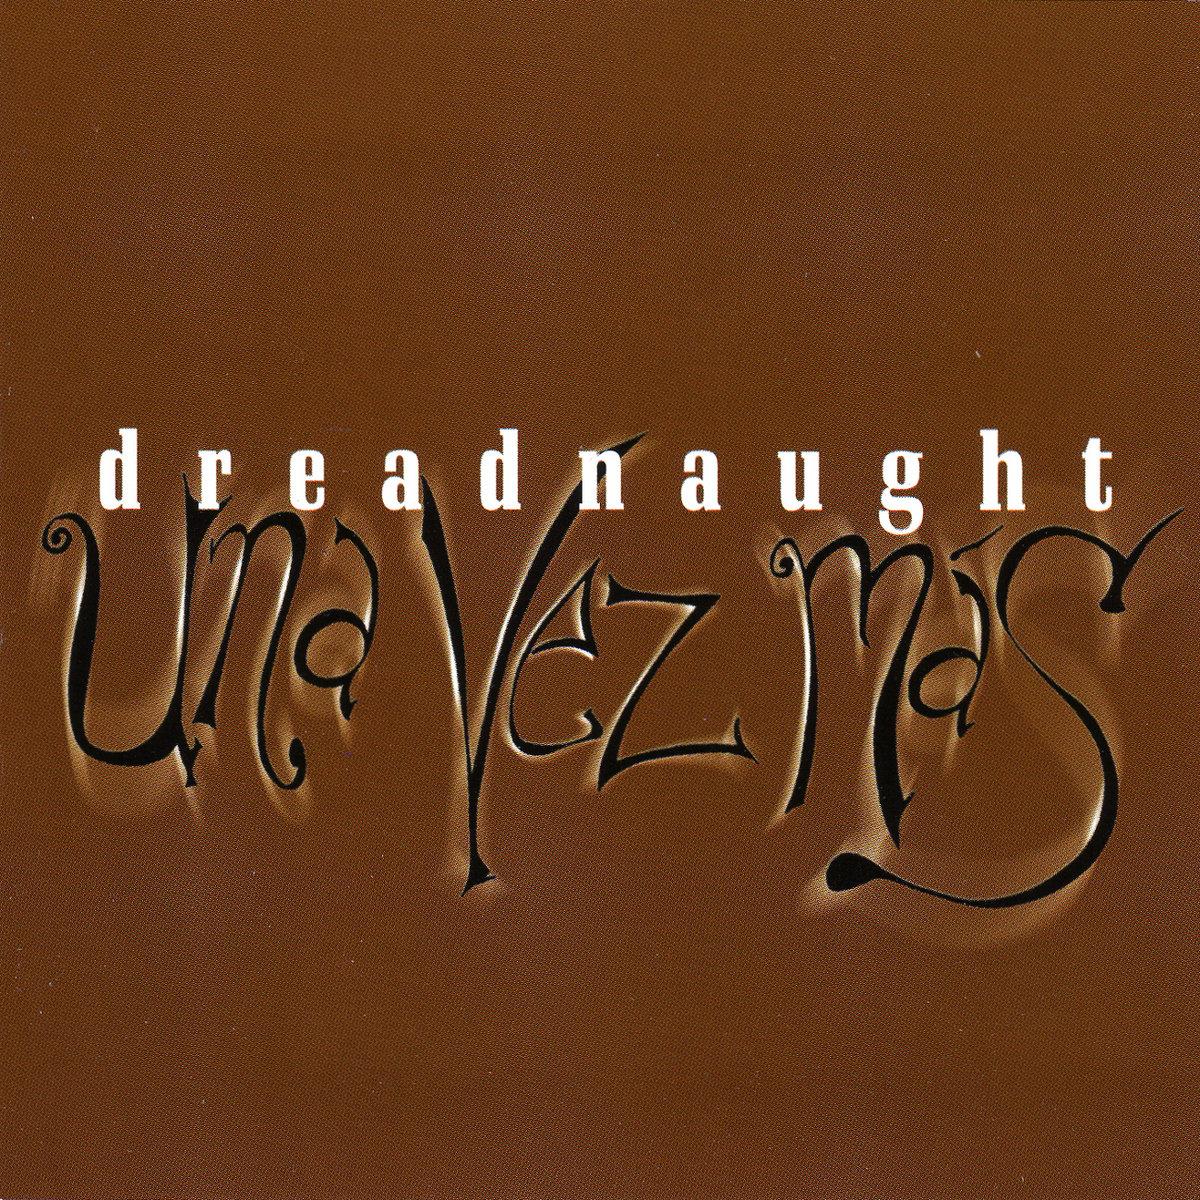 """Danny"" (From UNA VEZ MAS) by Dreadnaught"